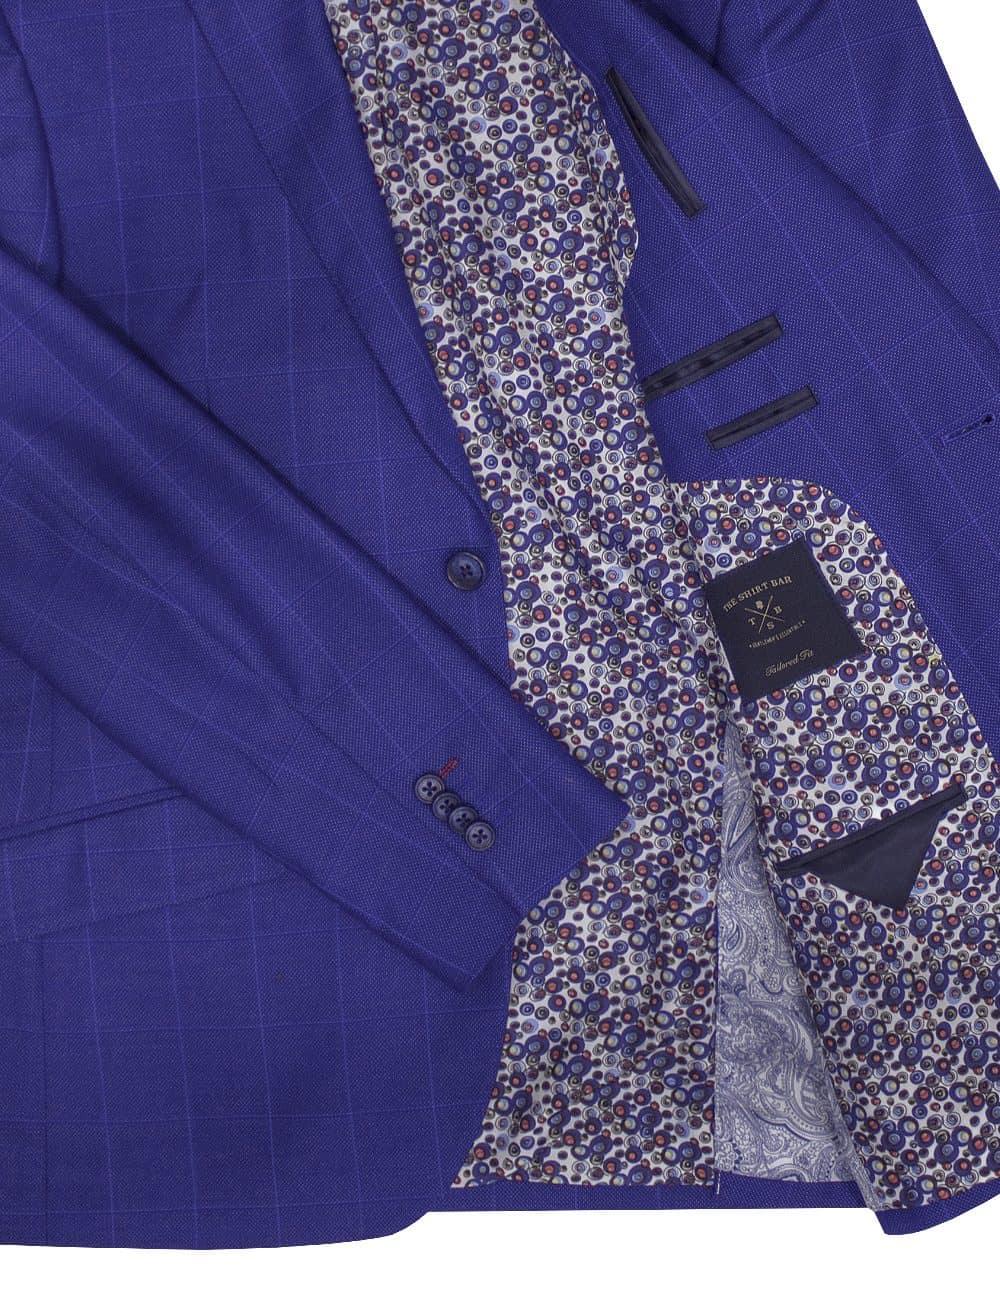 Slim Fit Royal Blue Checks Single Breasted Blazer - S2B6.4